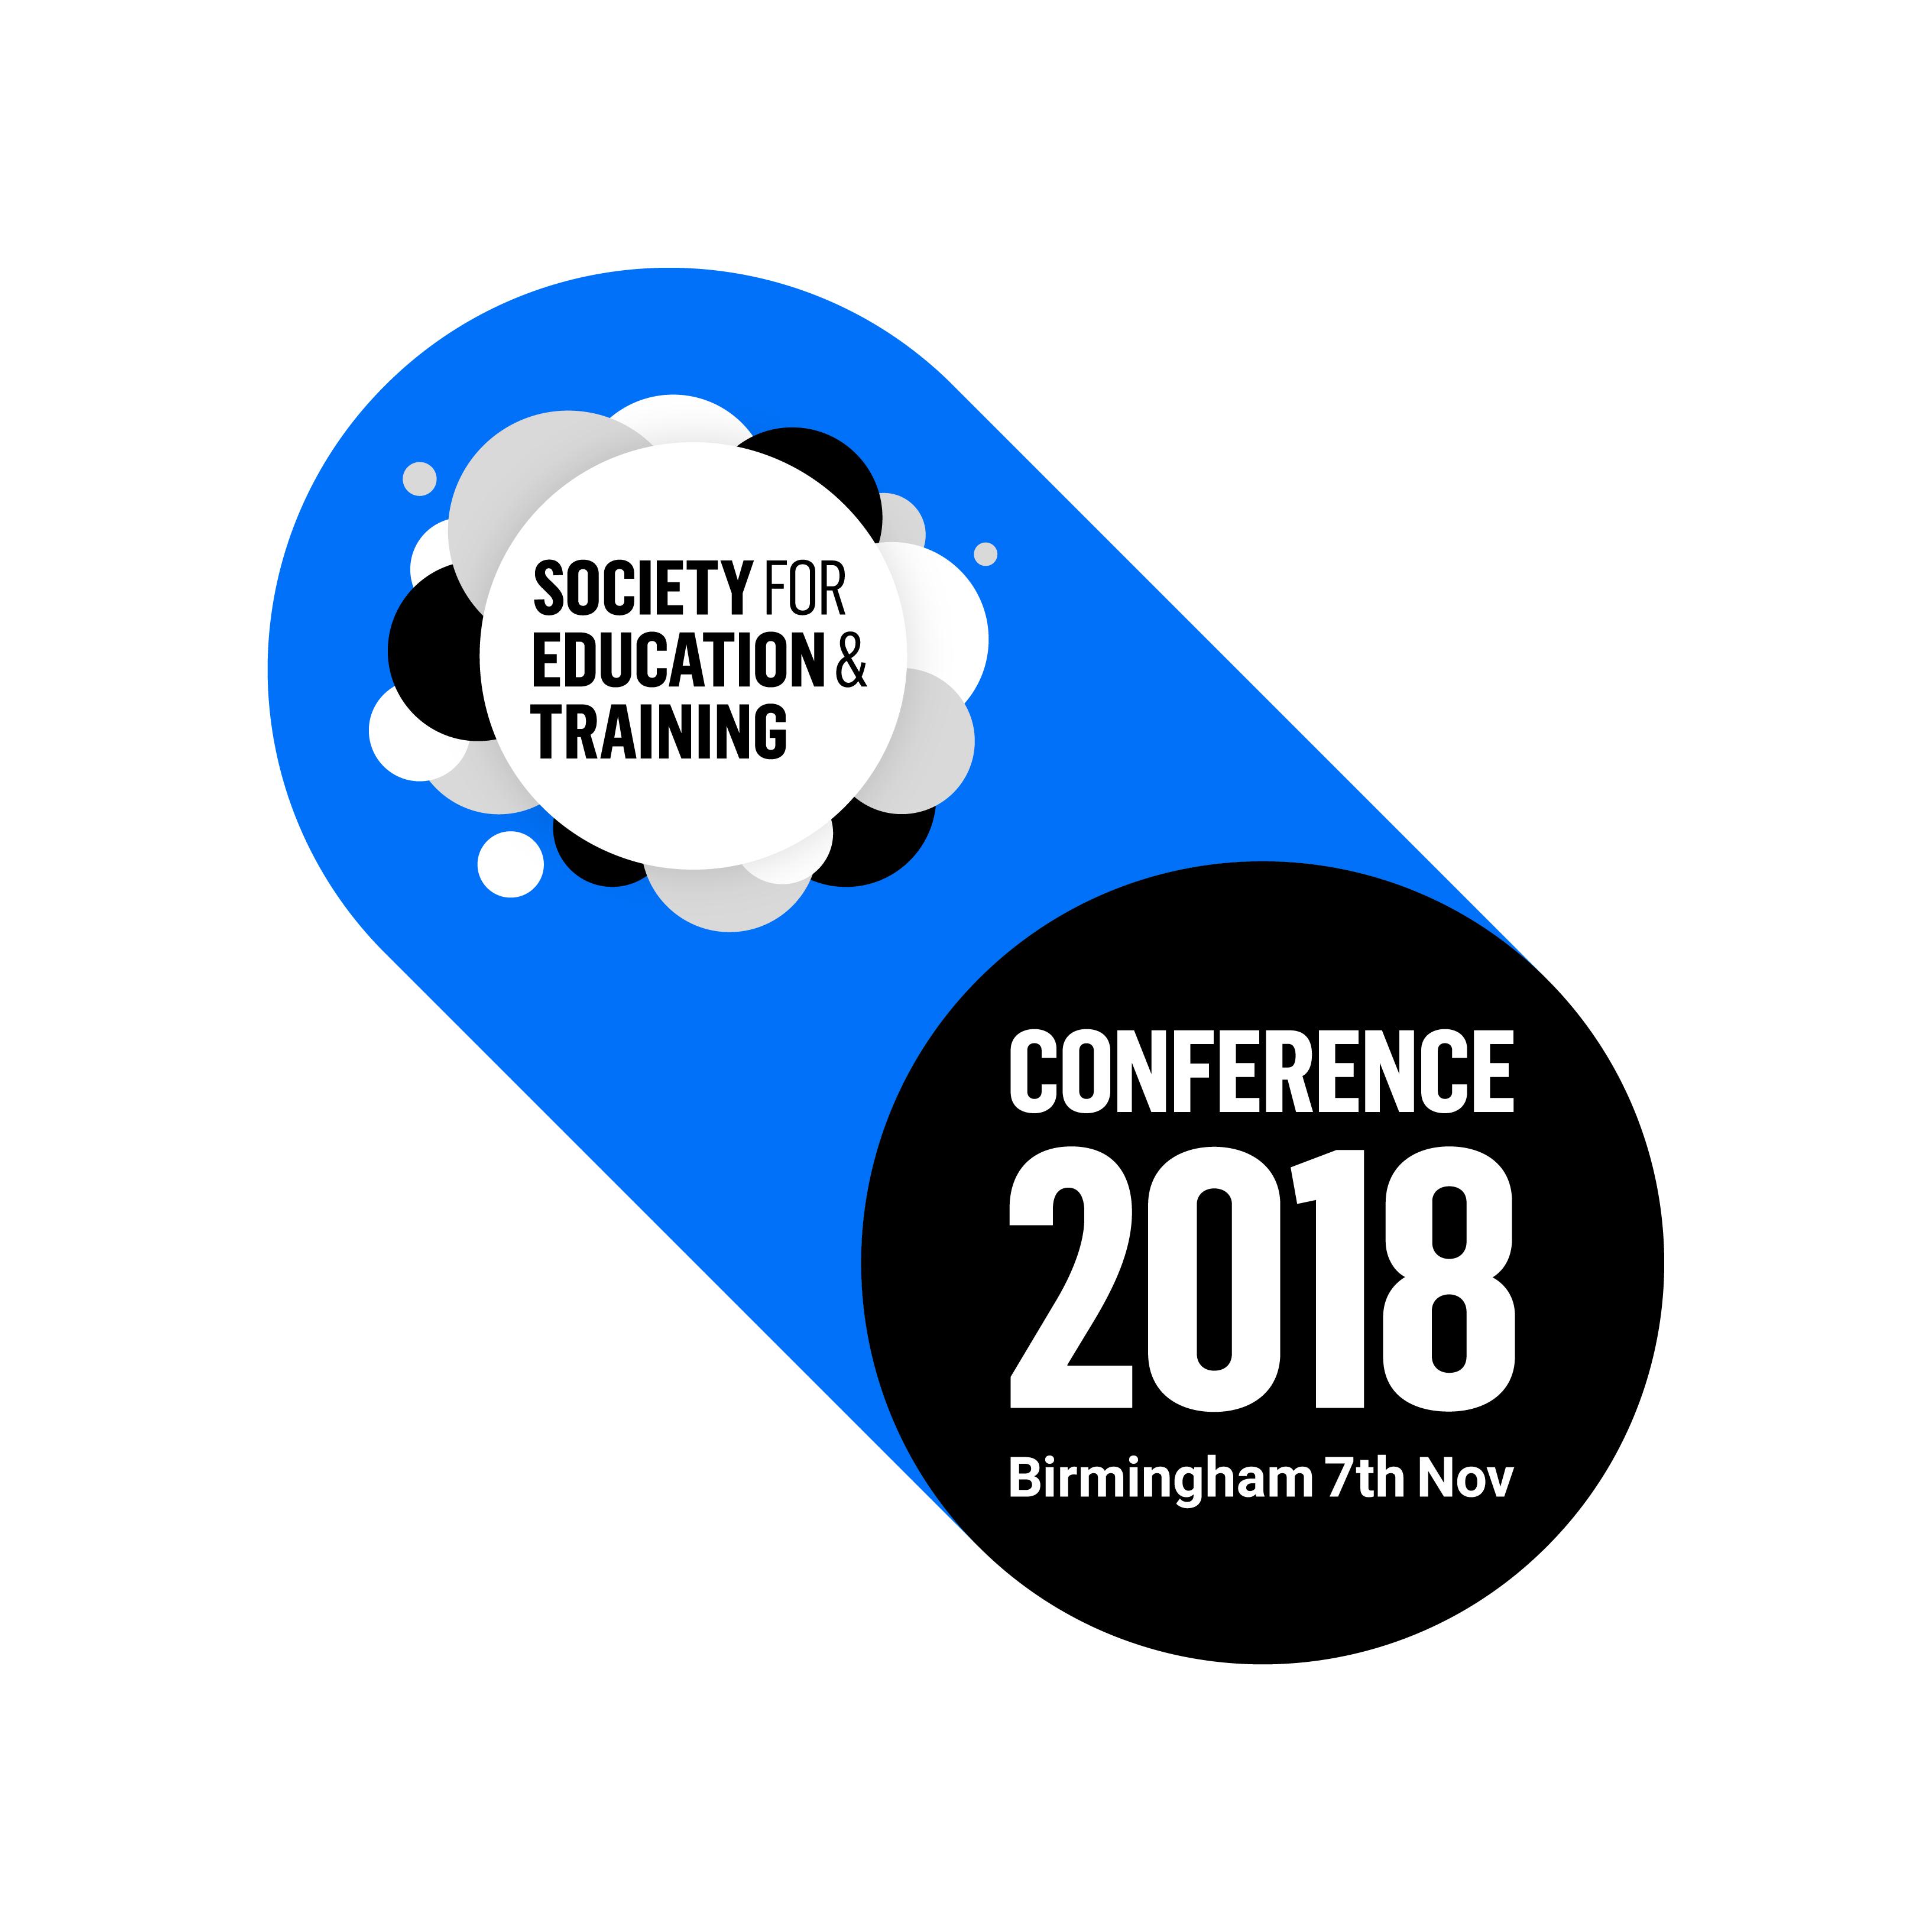 Society for Education & Training - Conference 2018 - Birmingham 7th Nov